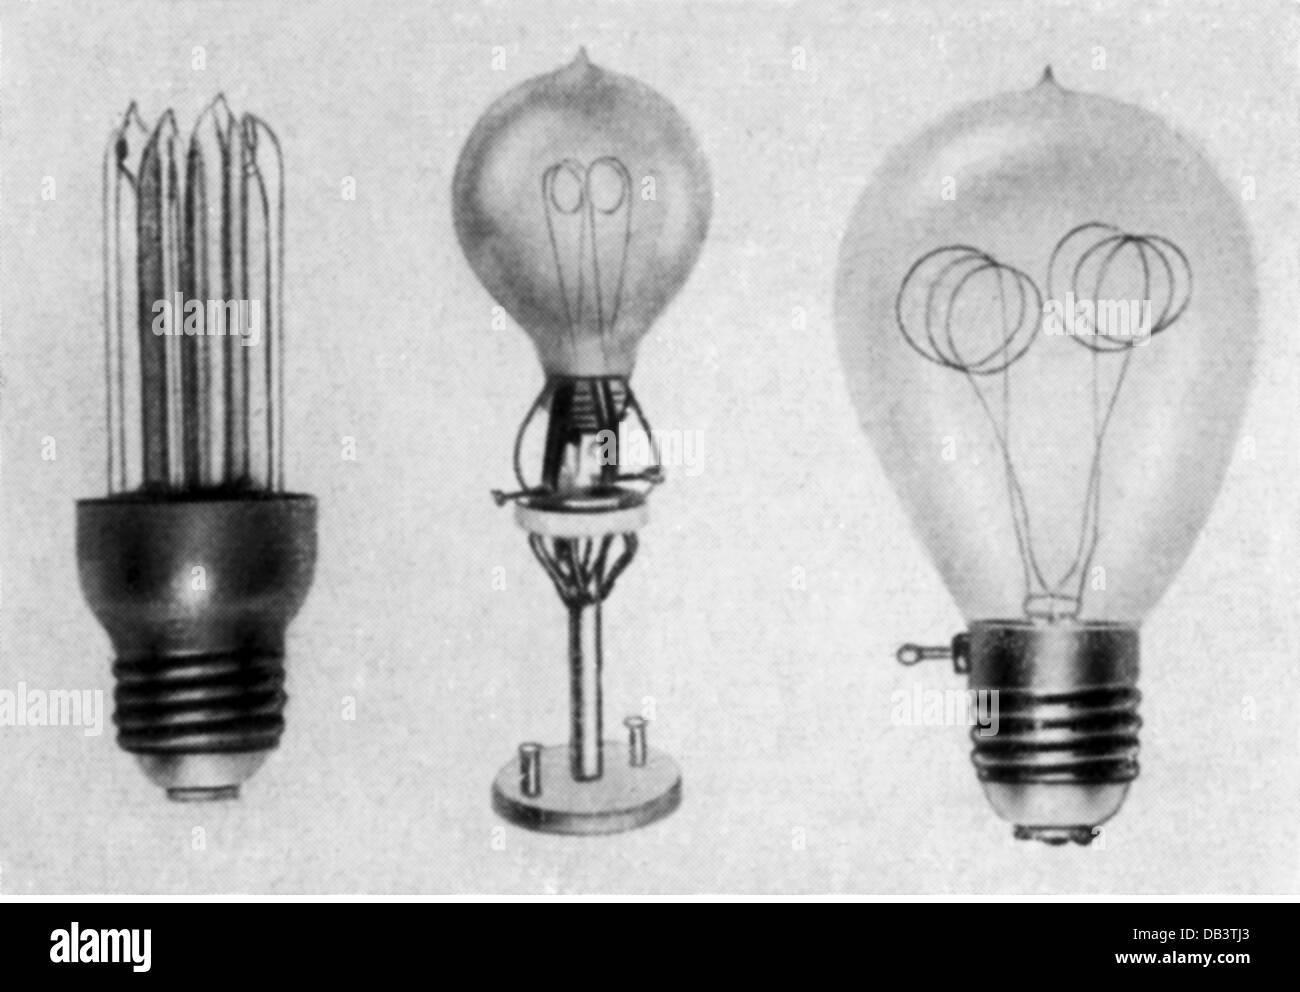 Behrens Task Lamp Black Includes Energy Efficient Light Bulb